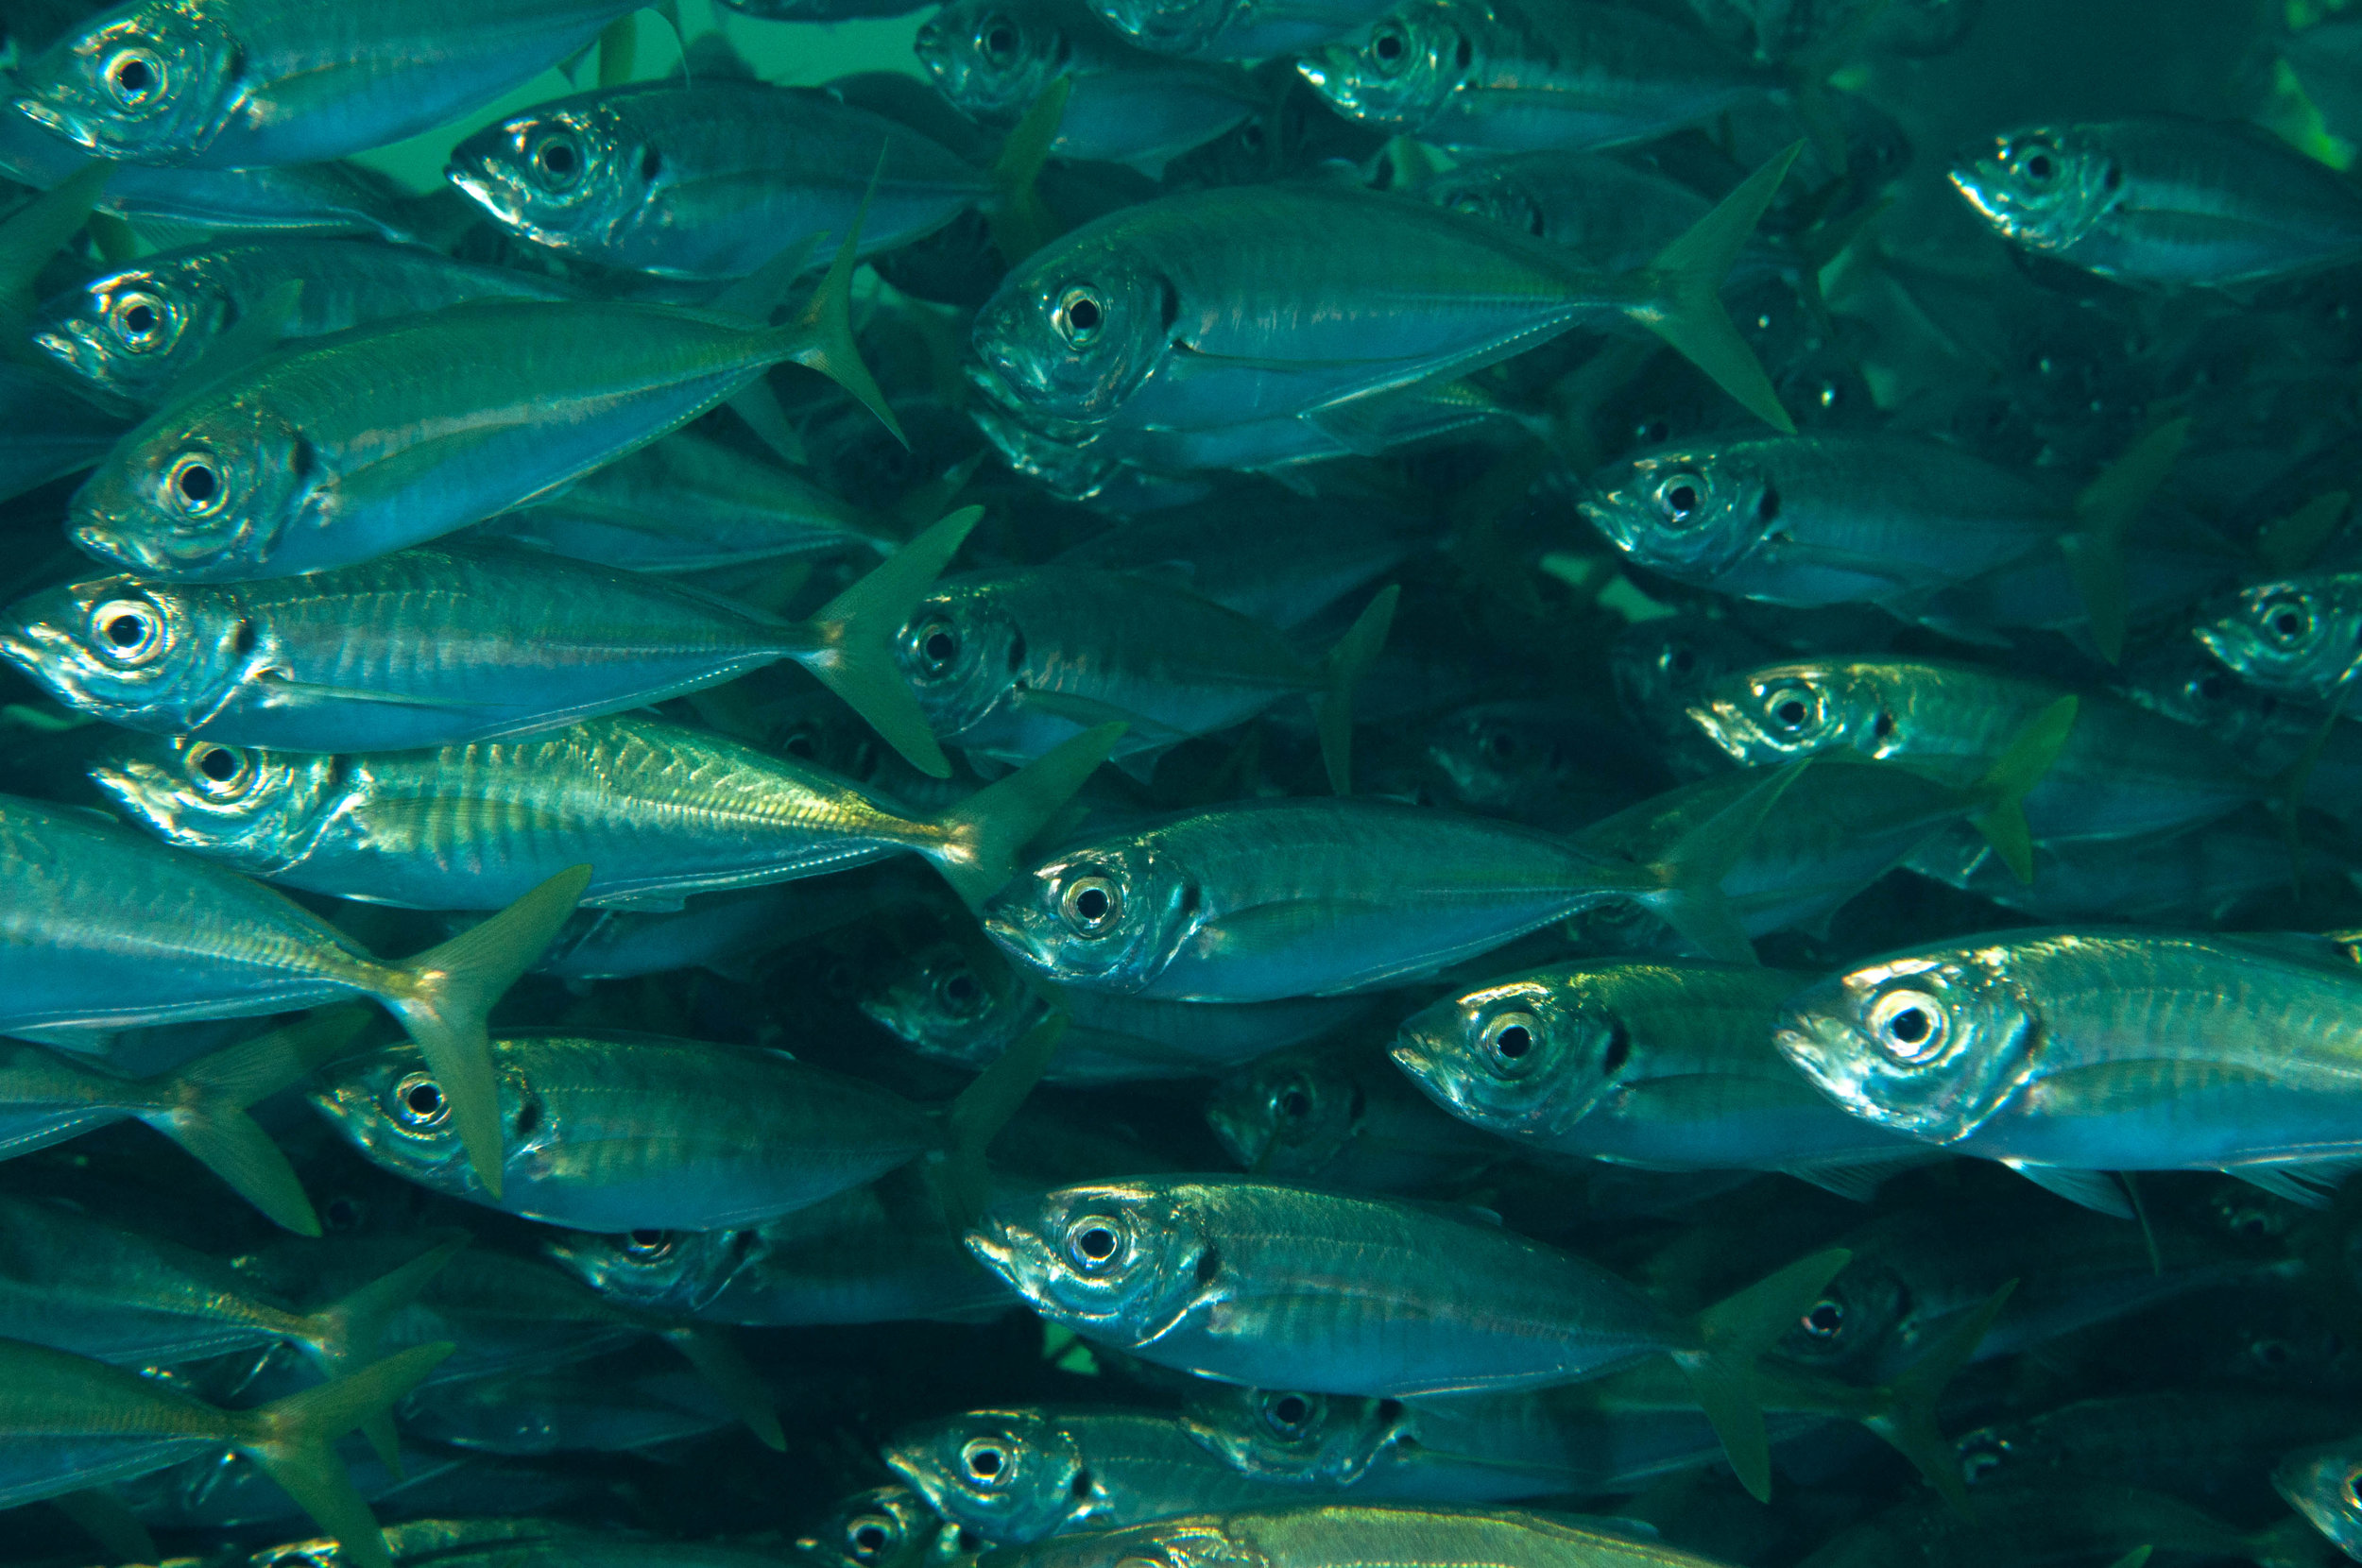 Horse mackerel (Trachurus declivis)